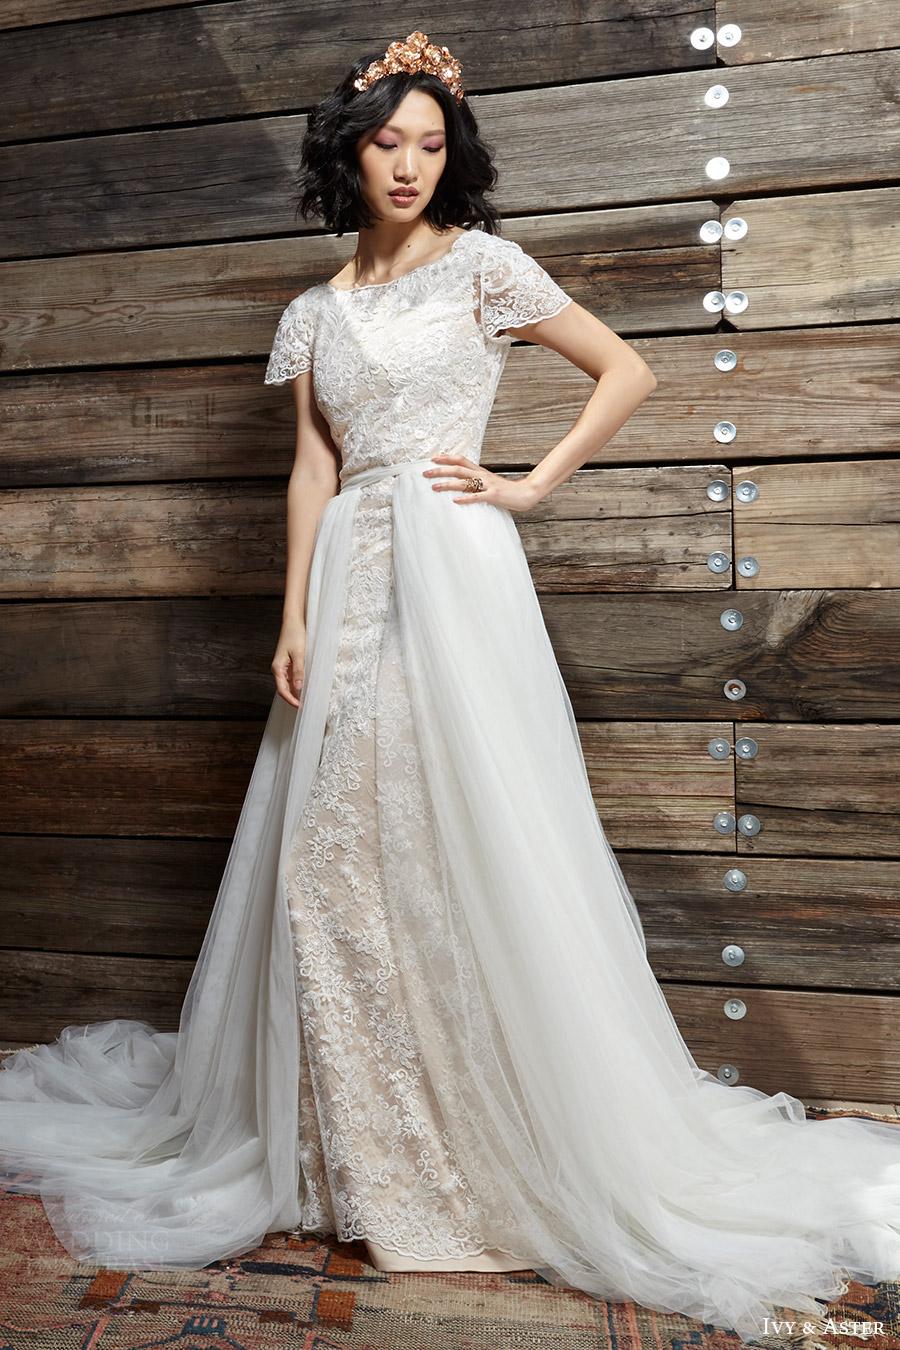 ivy aster bridal spring 2017 cap sleeves jewel neck lace wedding dress (sylvia vera overskirt) fv scoop back